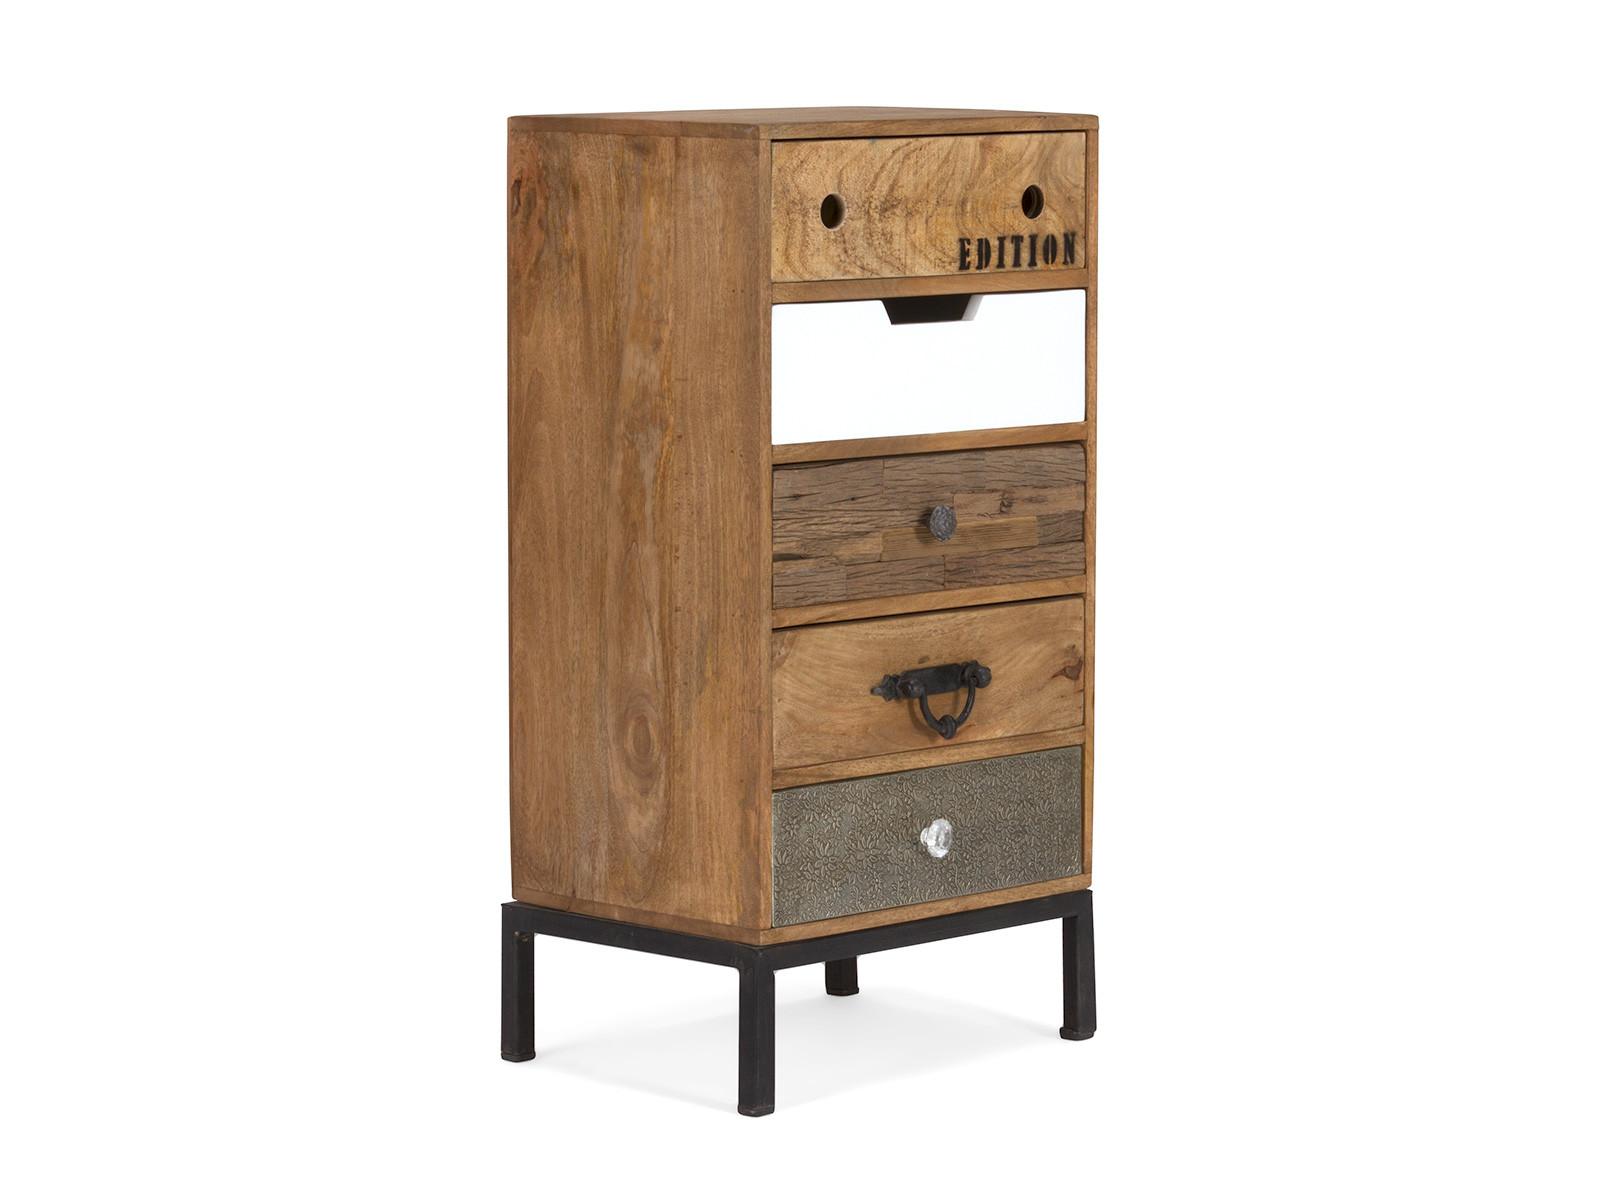 massivholz kommode mangoholz versandkostenfreie m bel online bestellen. Black Bedroom Furniture Sets. Home Design Ideas